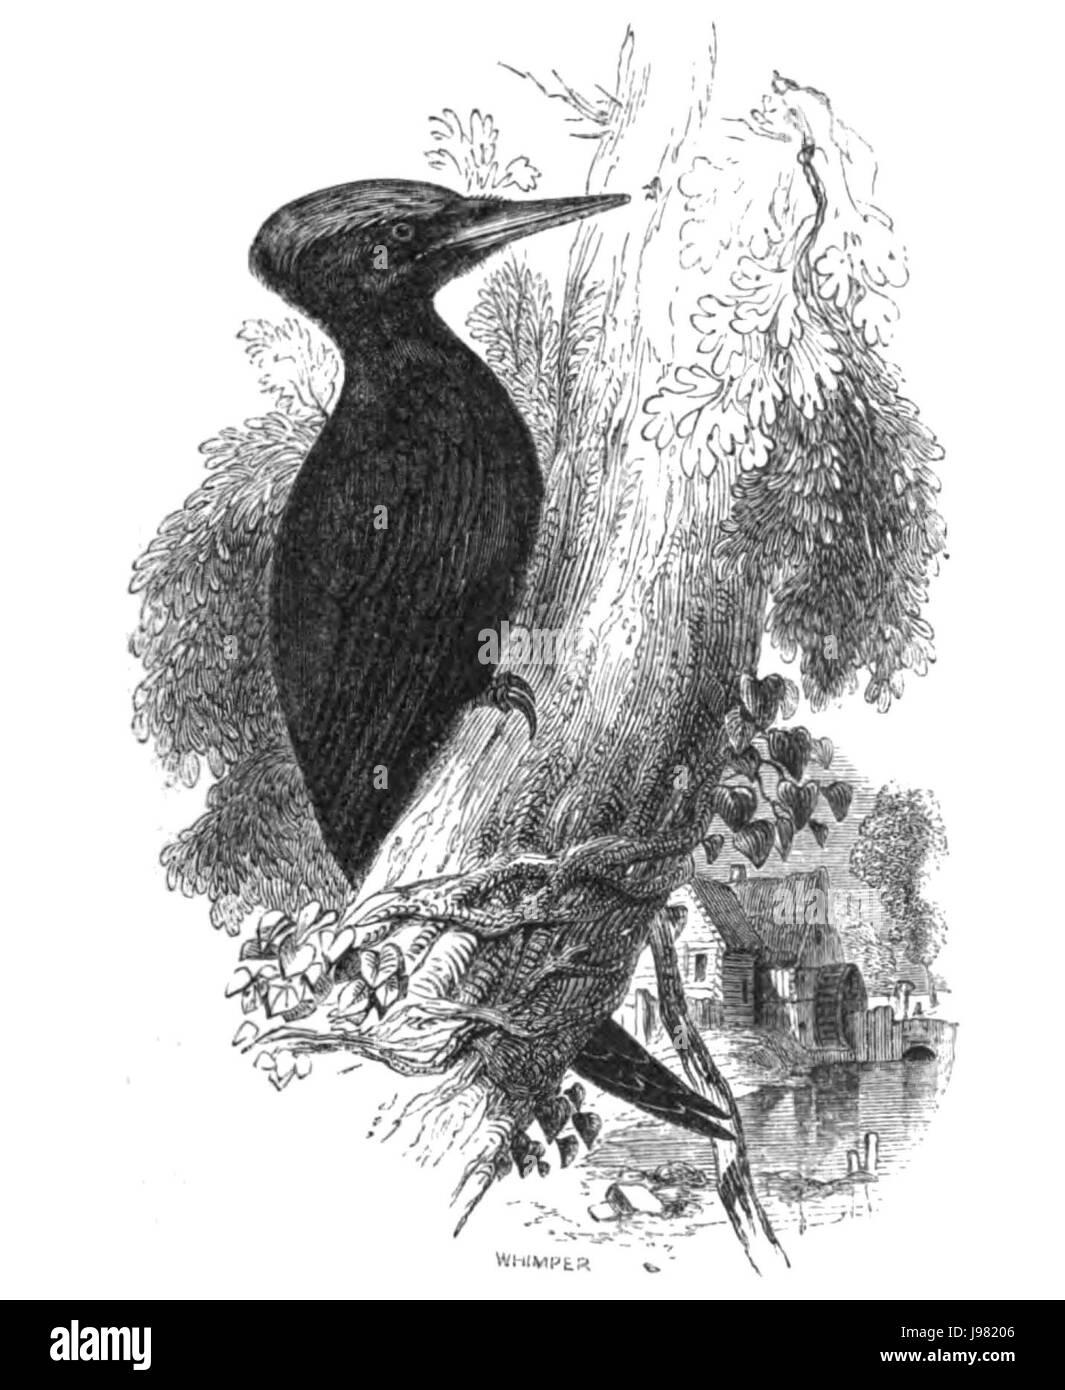 Natural History, Birds   Woodpecker - Stock Image